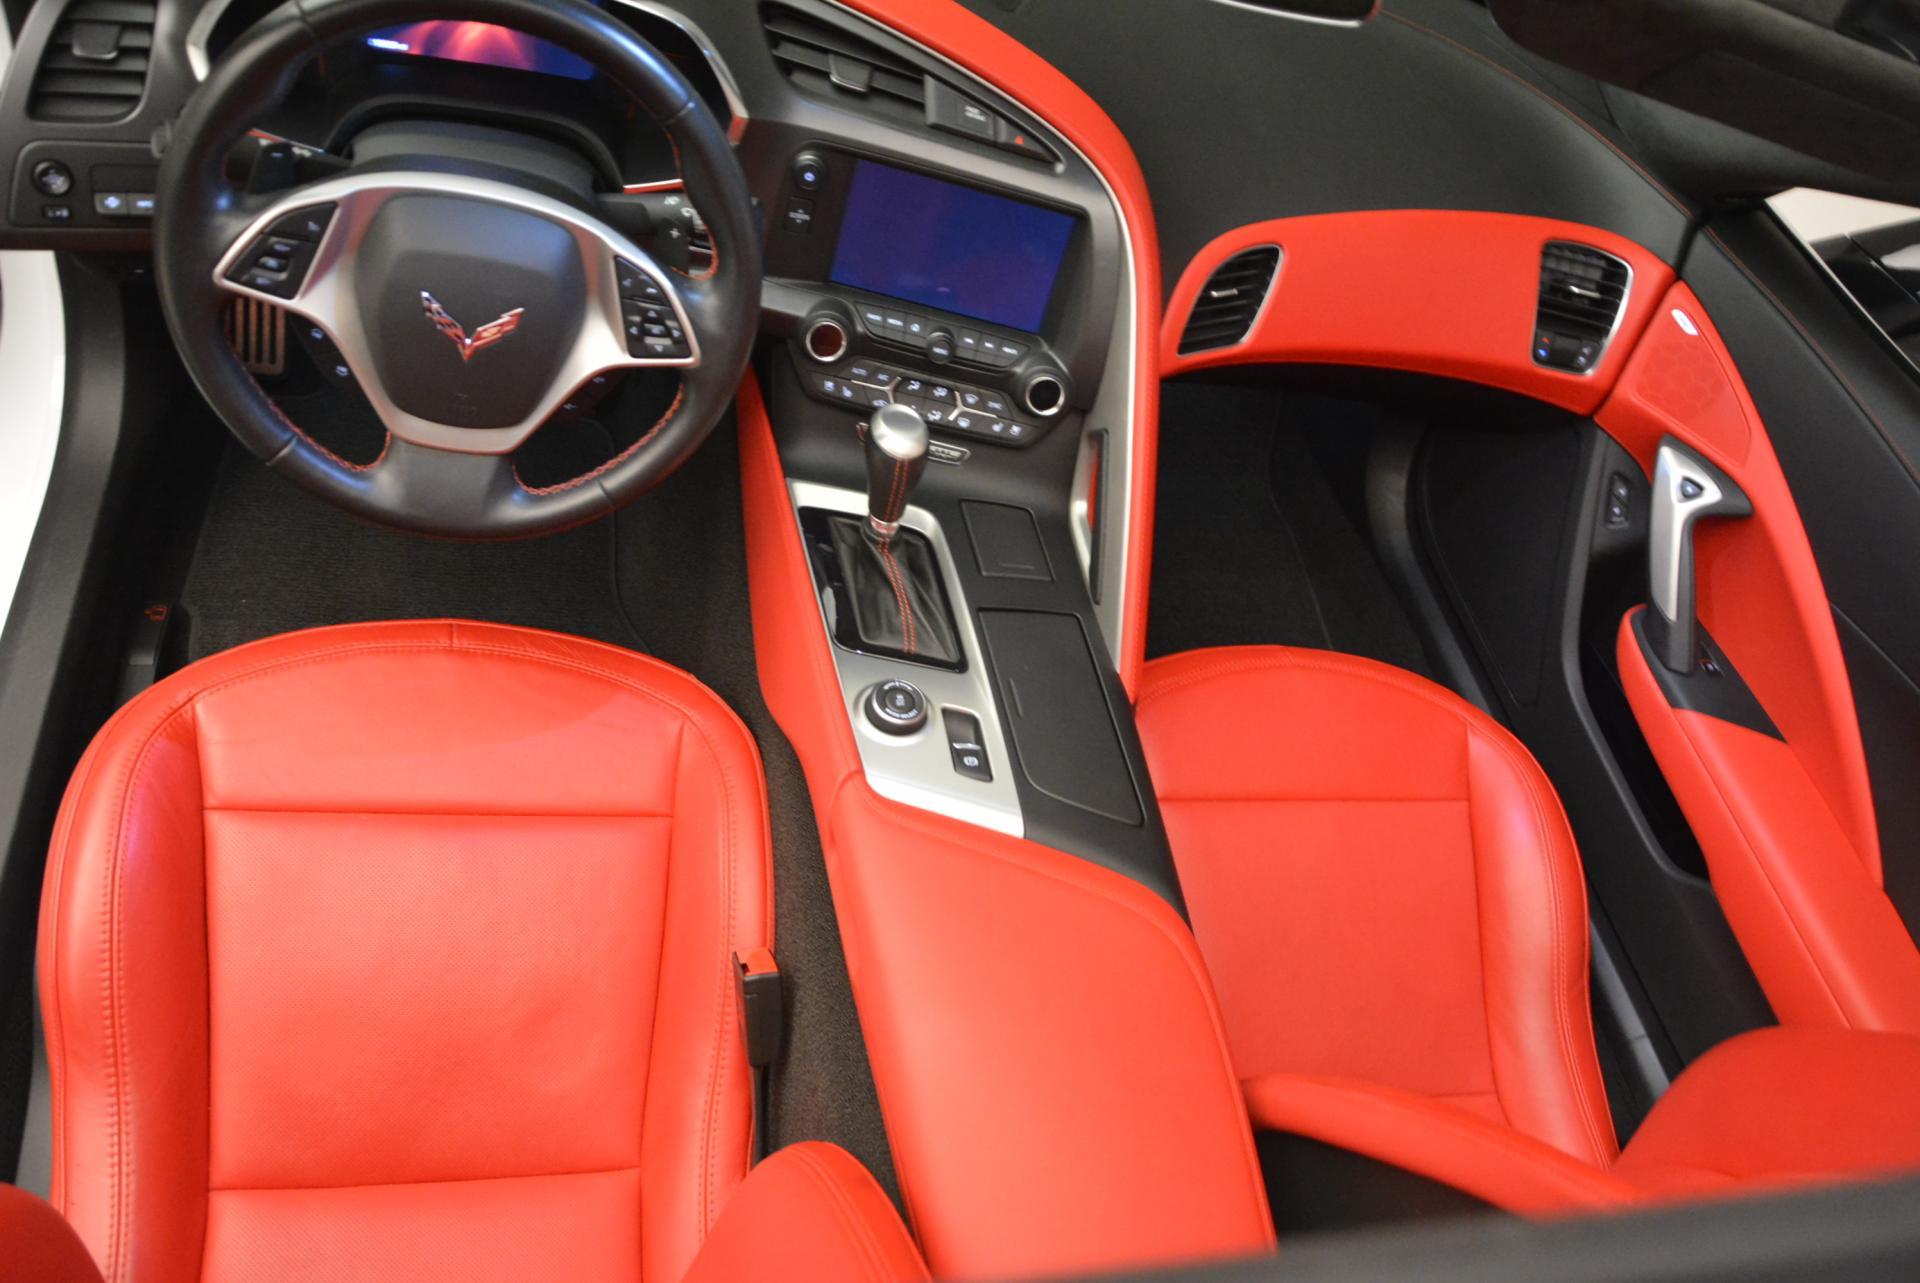 Used 2014 Chevrolet Corvette Stingray Z51 For Sale In Greenwich, CT 529_p17